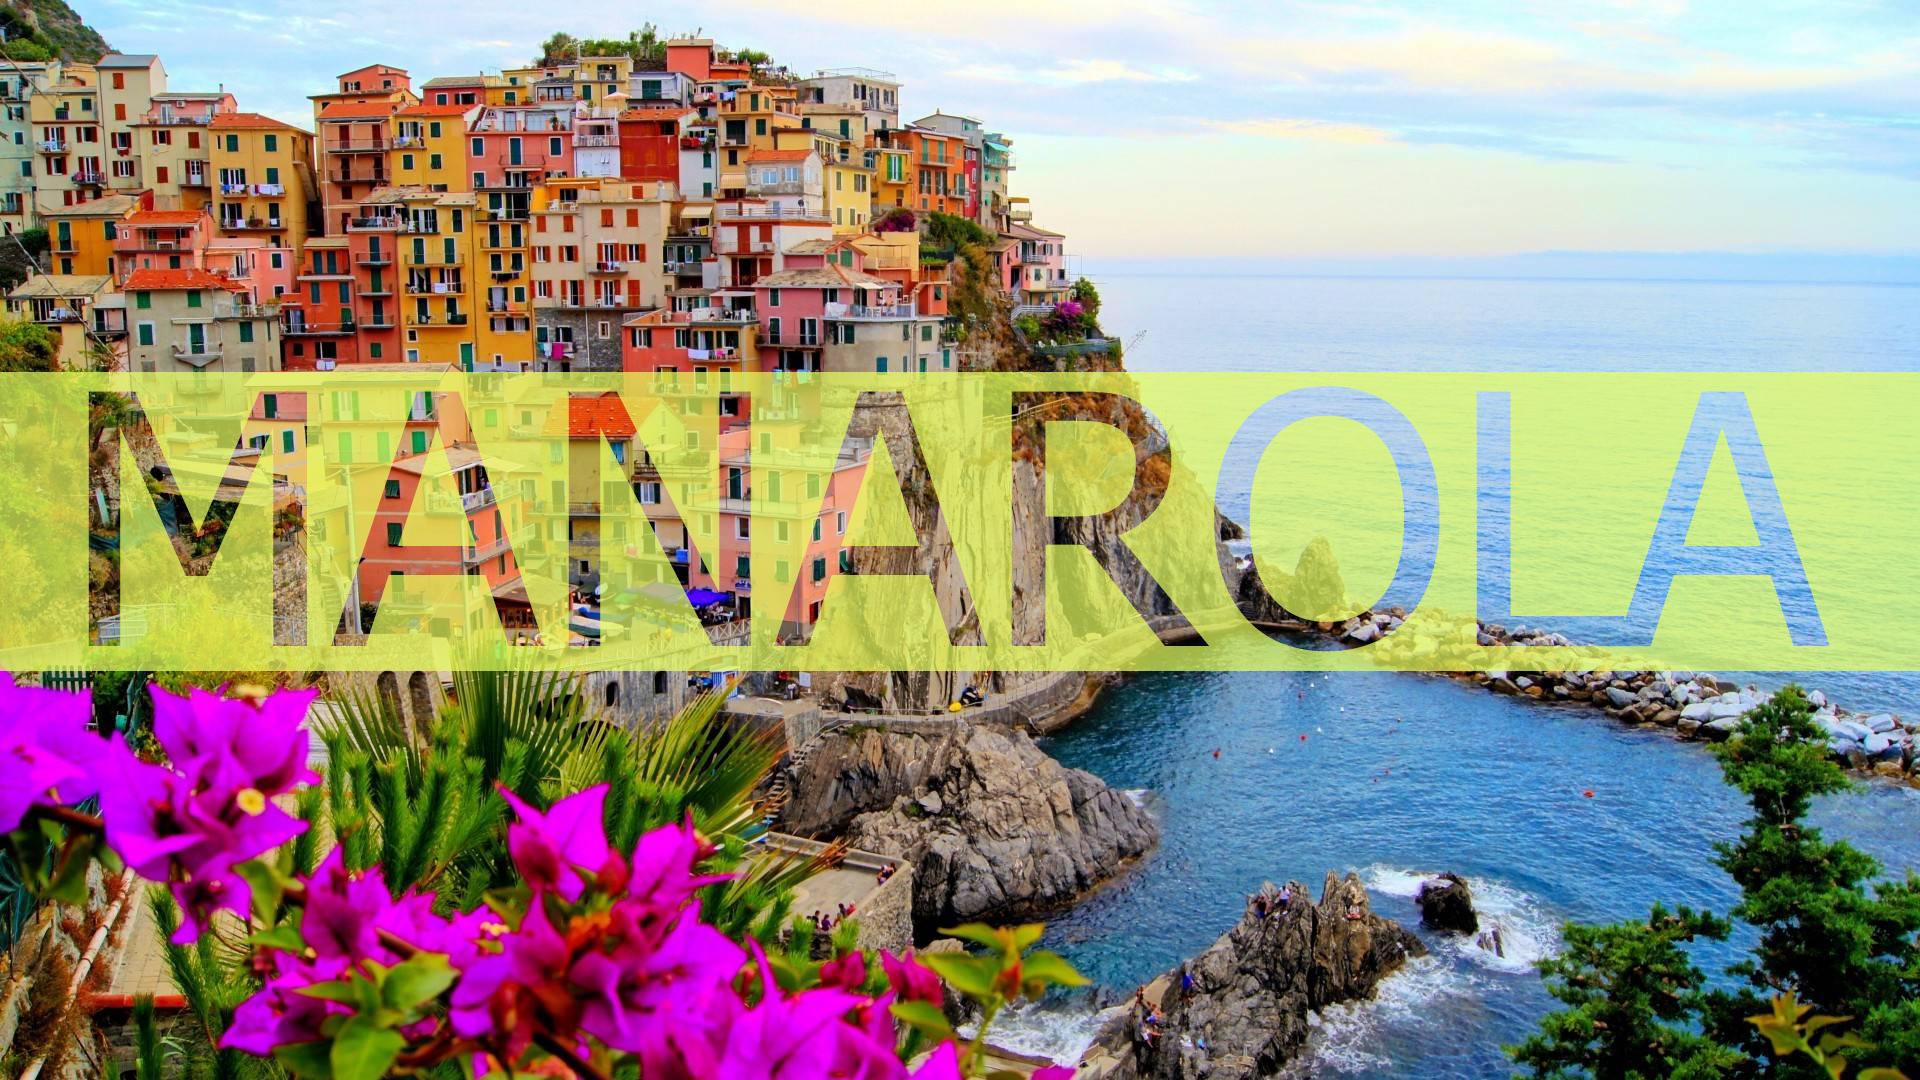 flowers-Manarola-ITALY-www.tourismprofile.com_